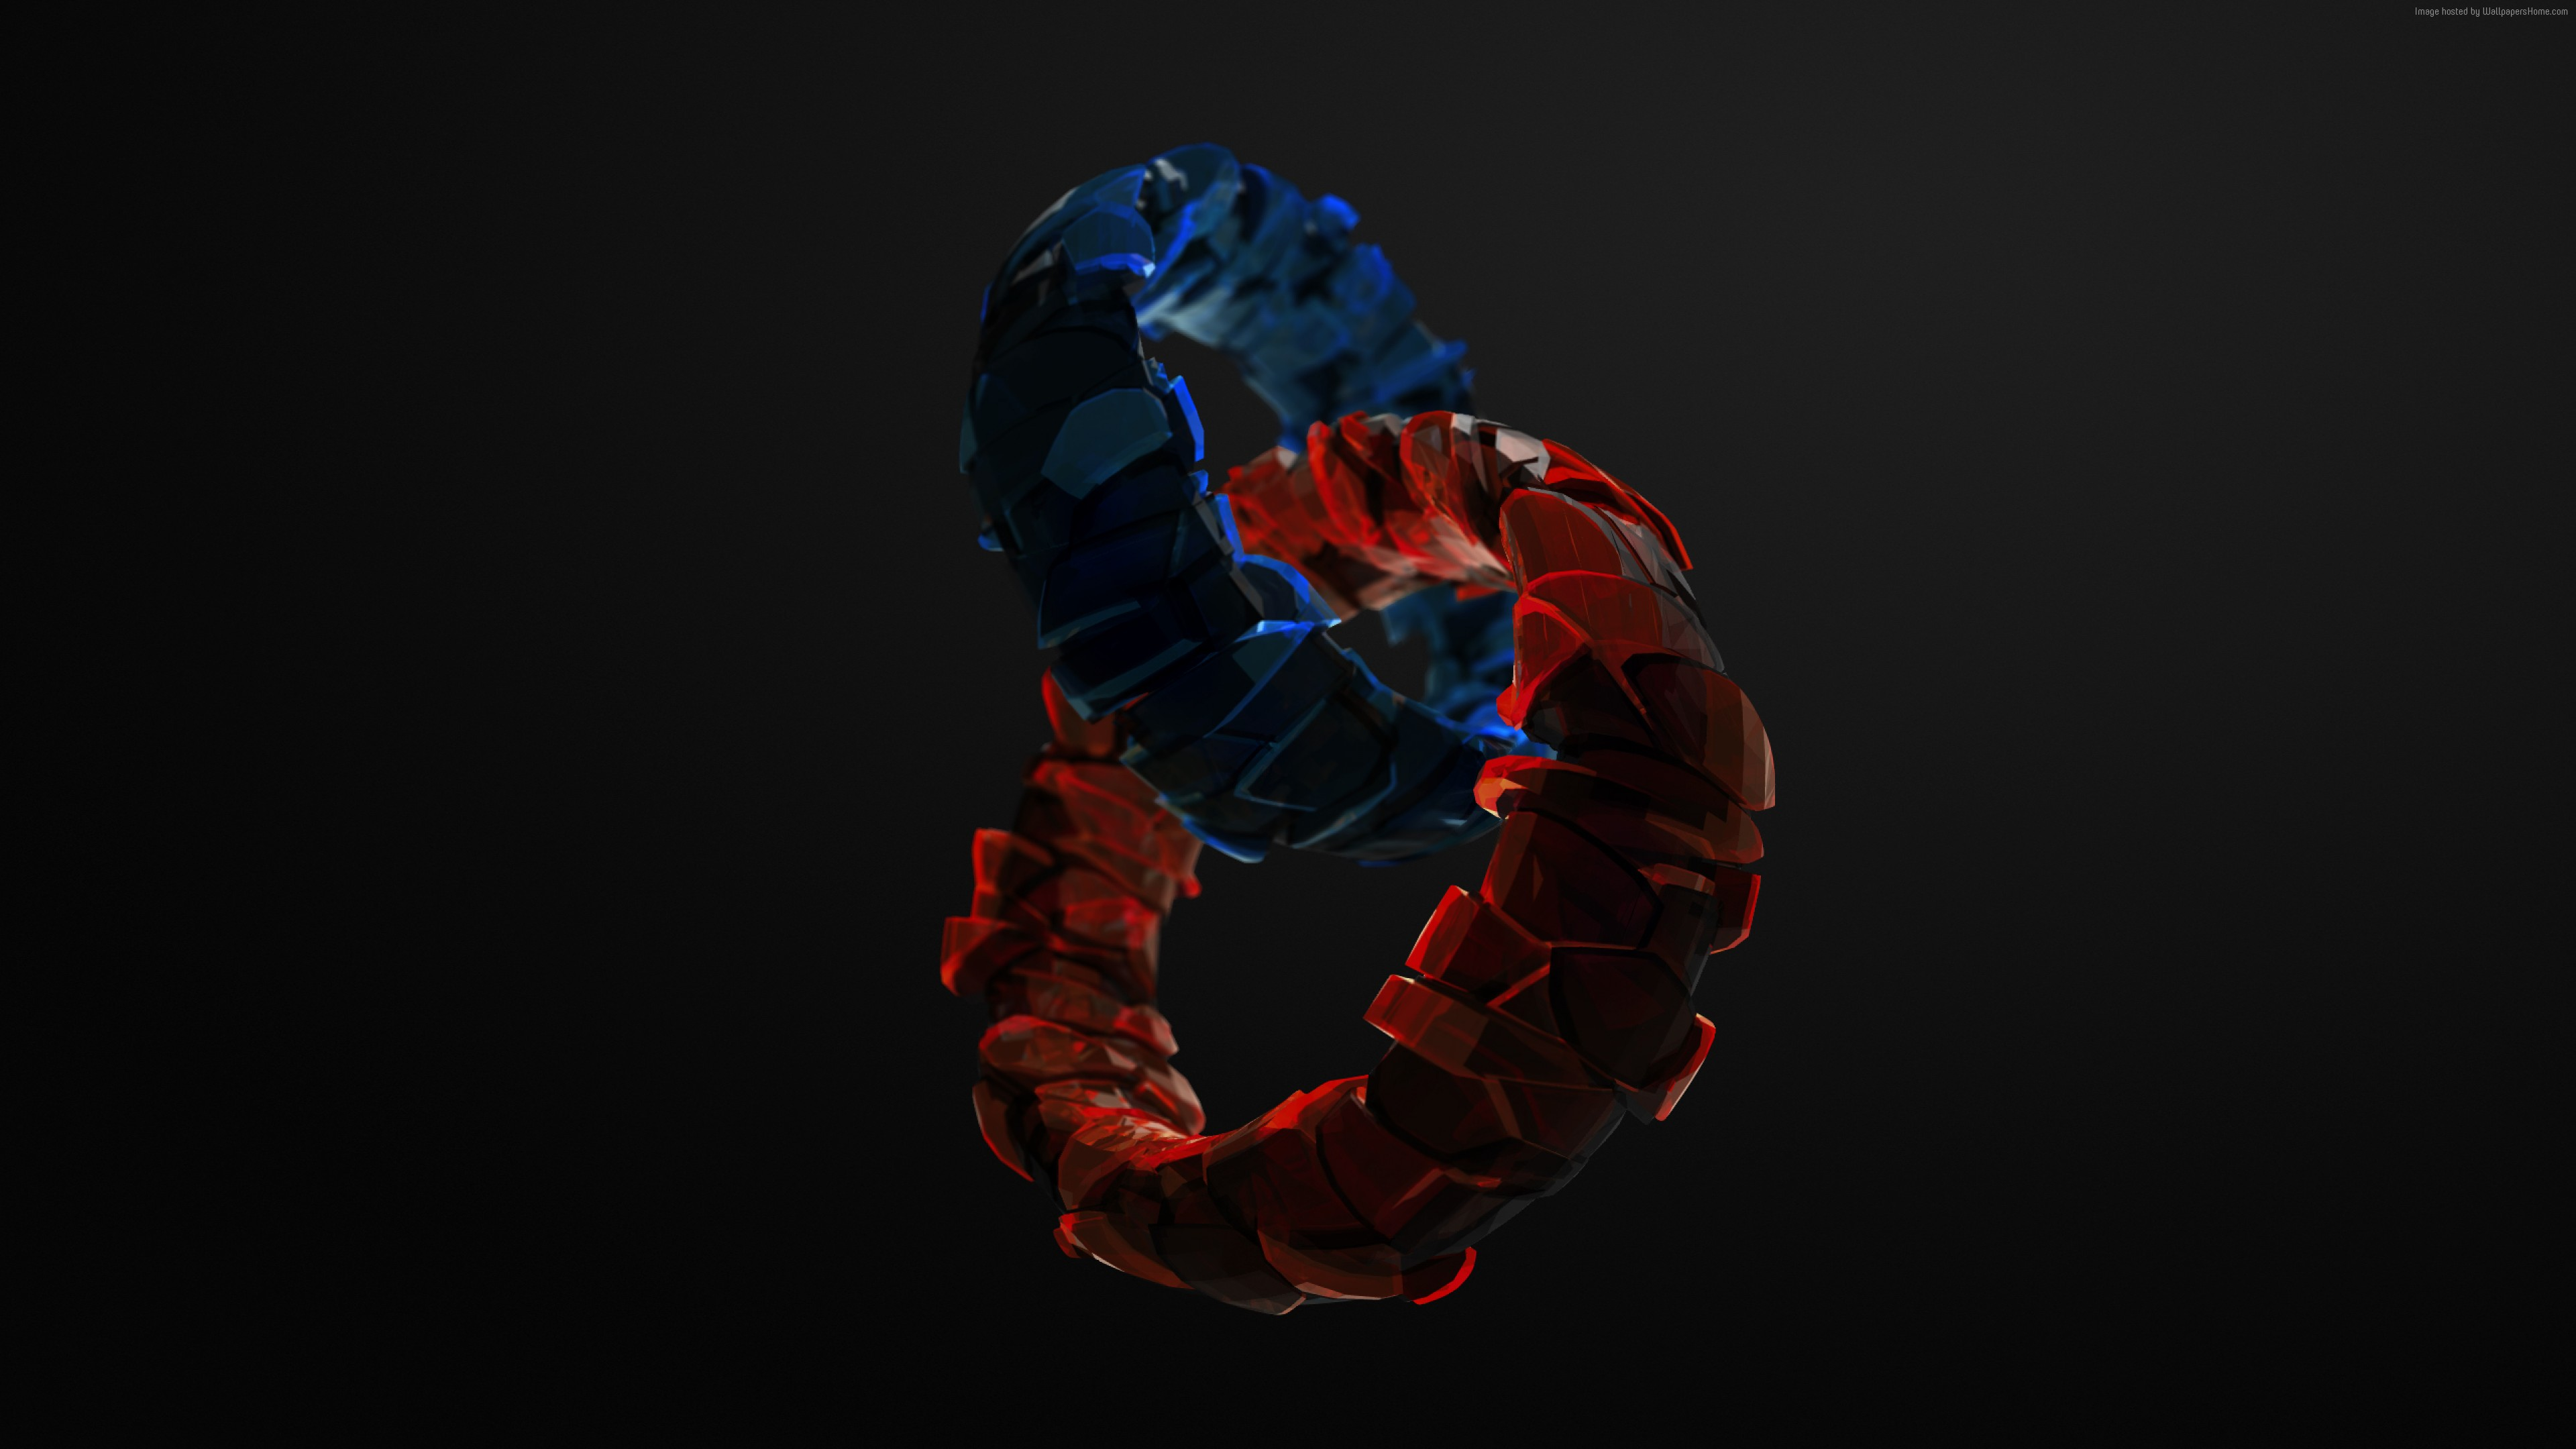 Wallpaper Rings 3d Blue Red Glass Hd Abstract Wallpaper Download High Resolution 4k Wallpaper